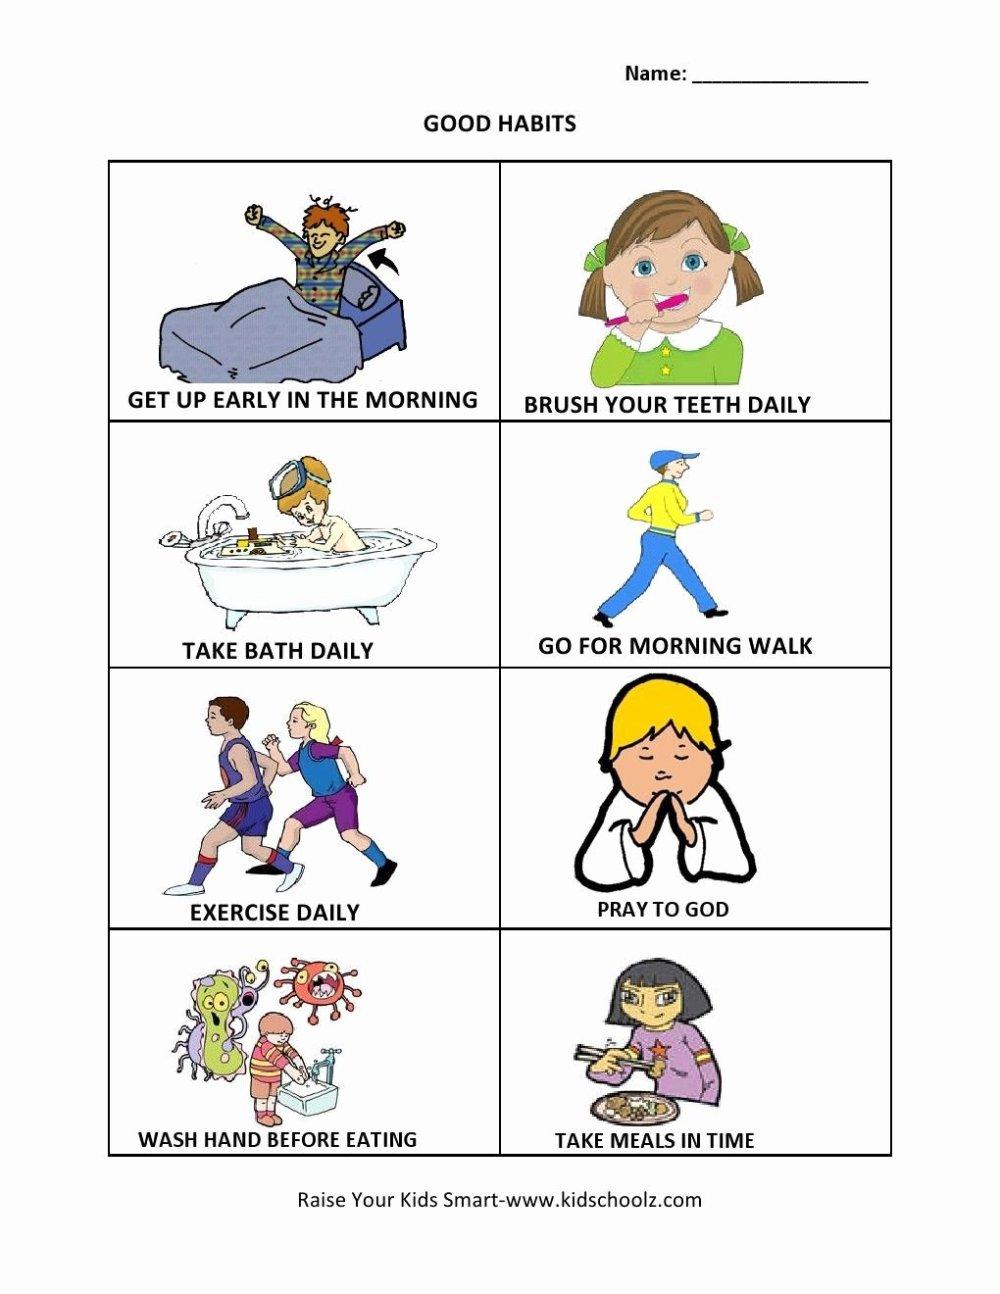 medium resolution of Good Habits Worksheets for Preschoolers Lovely Hygiene Worksheets Personal  Preschool Ks2 Ks4 Teenage Youth – Printable Worksheets for Kids